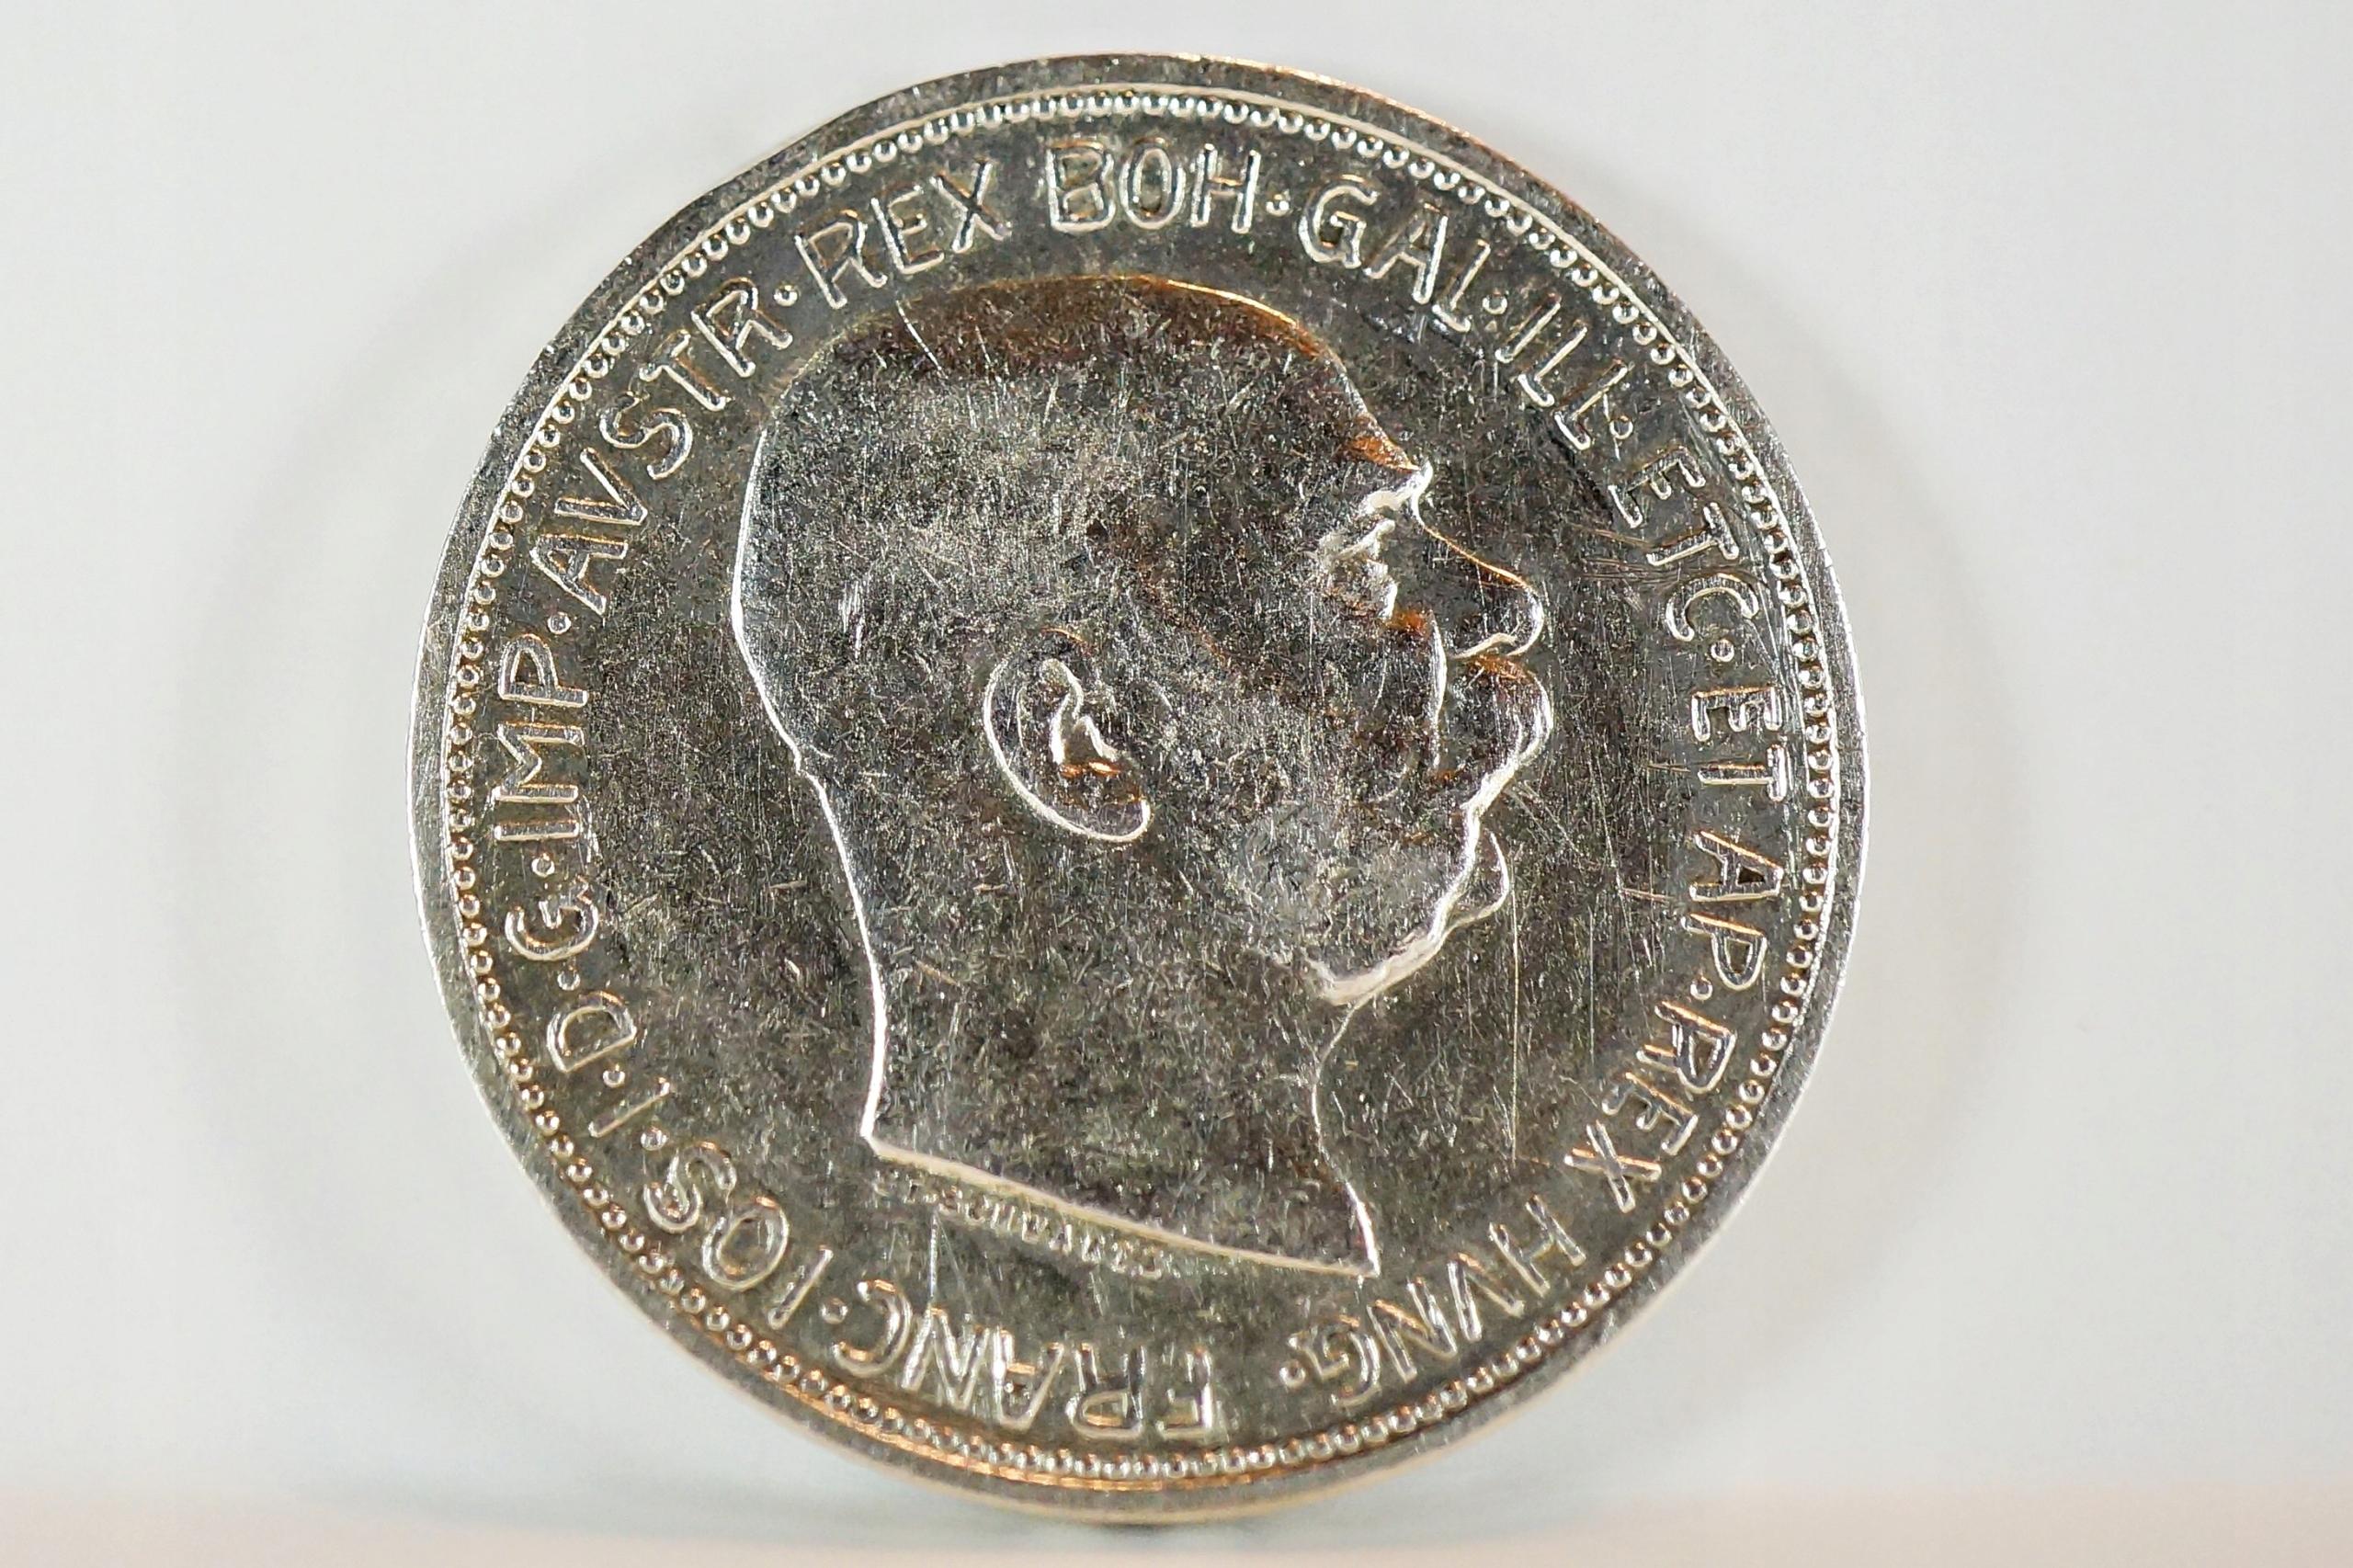 Austria - 2 Corona - Franz Joseph I 1912